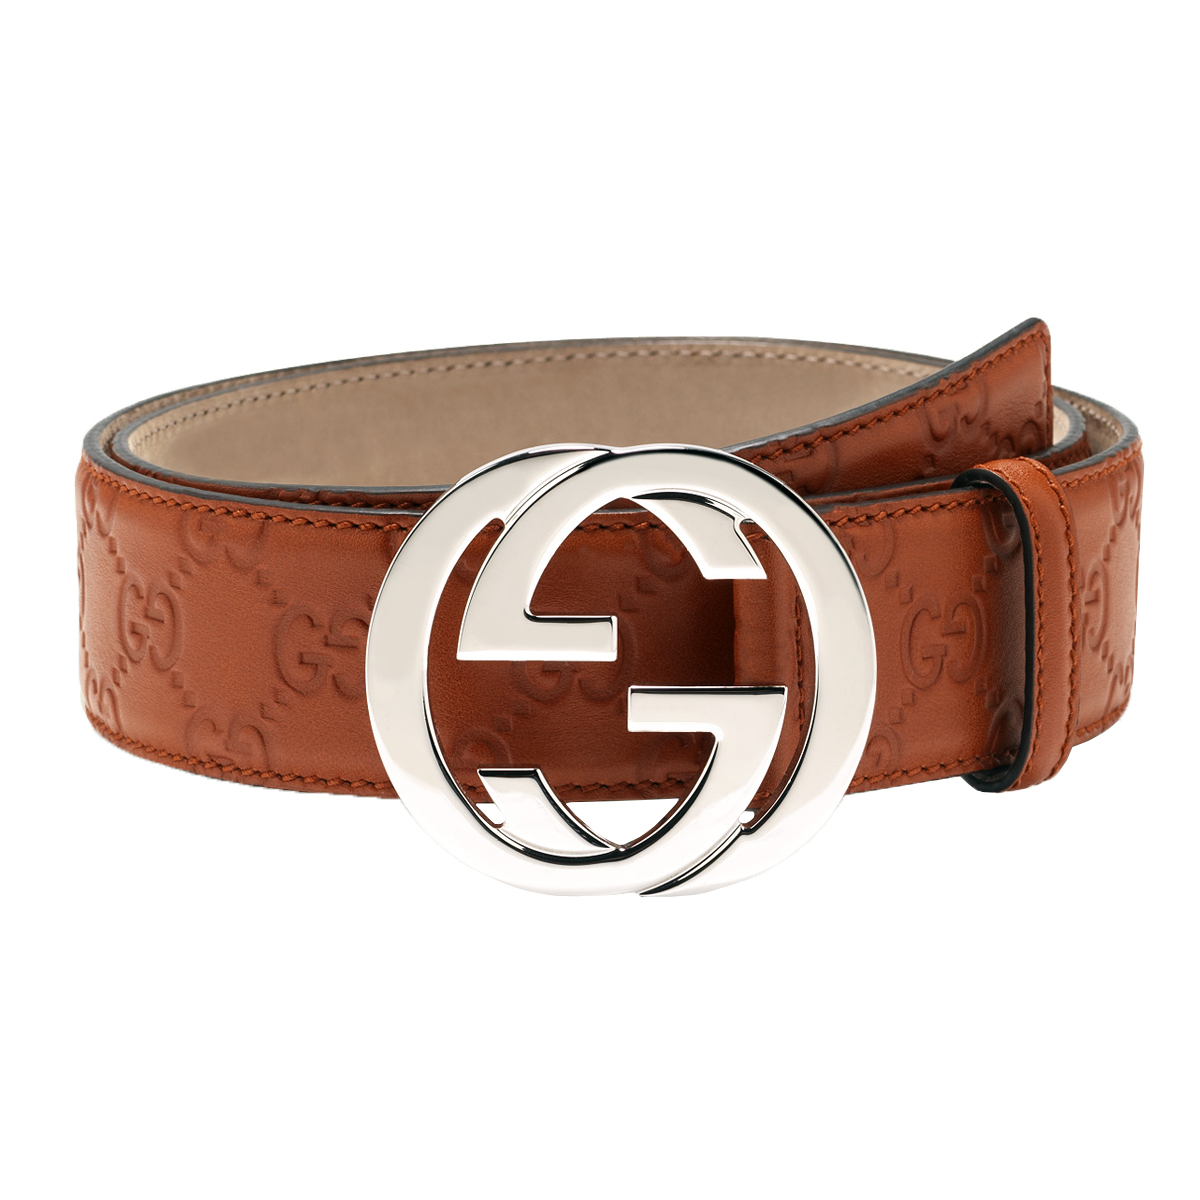 12982040c Gucci Orange Guccissima Leather Interlocking G Buckle Belt 105/42